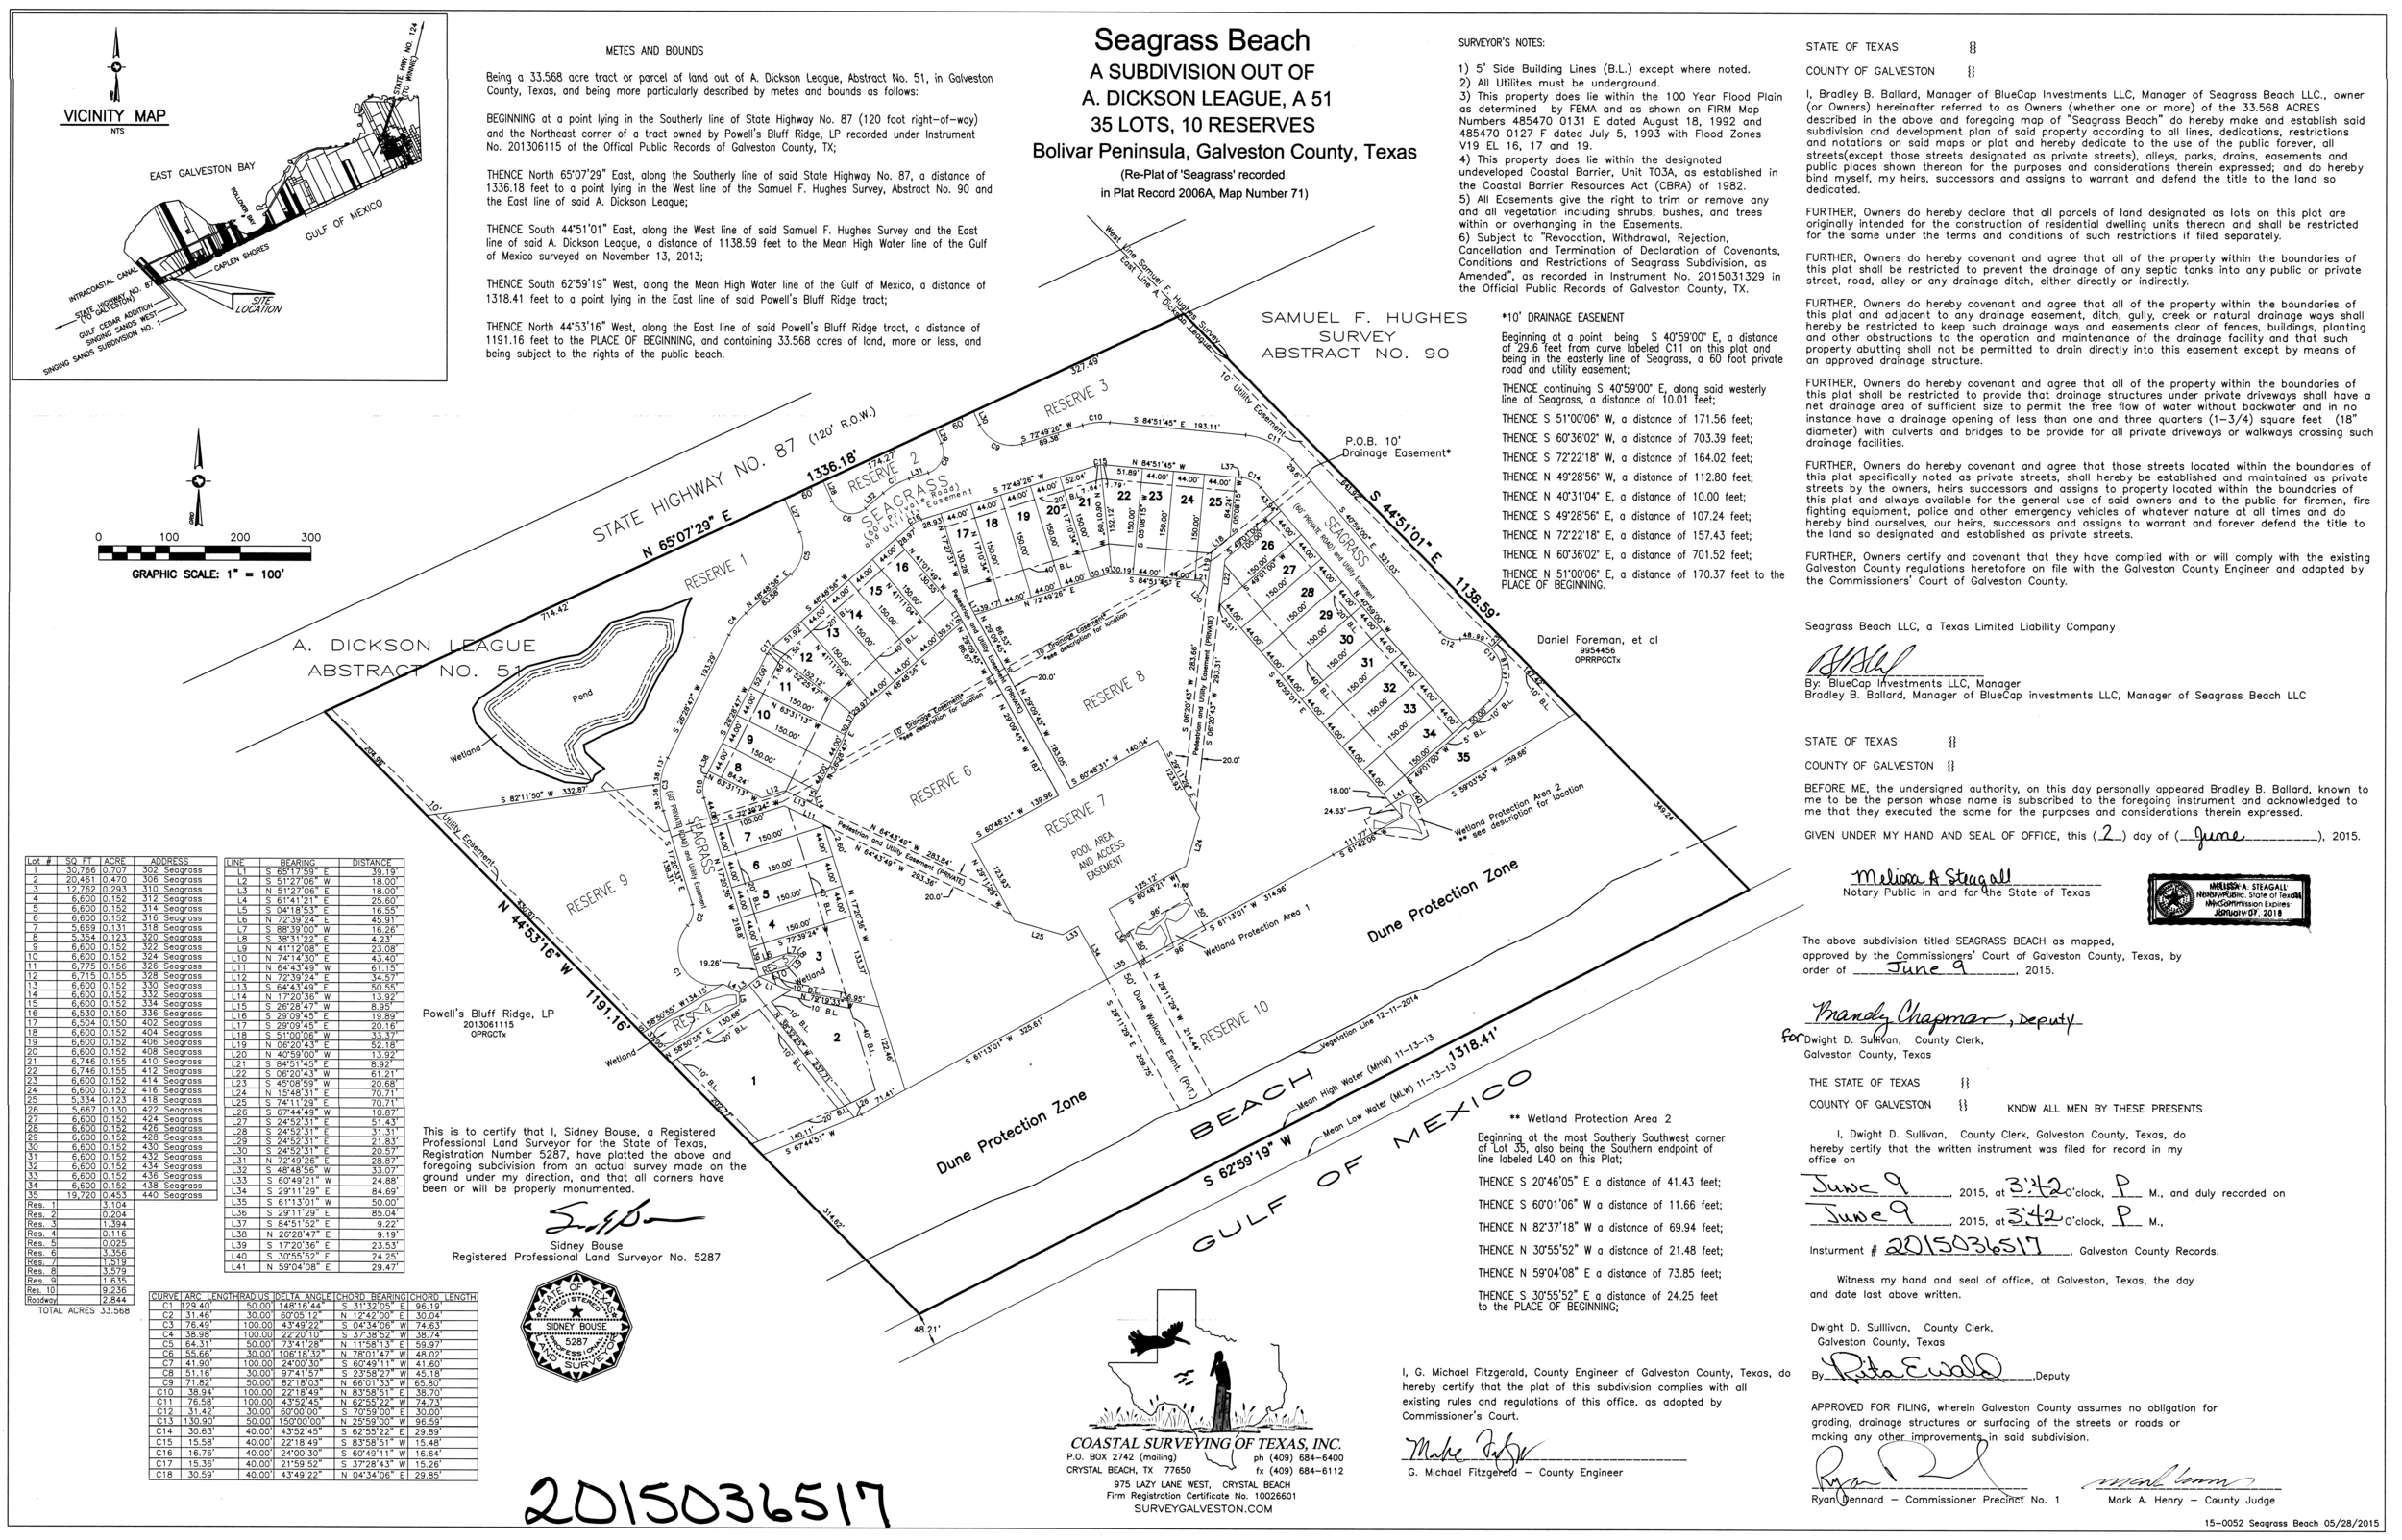 Seagrass Beach Subdivision Plat